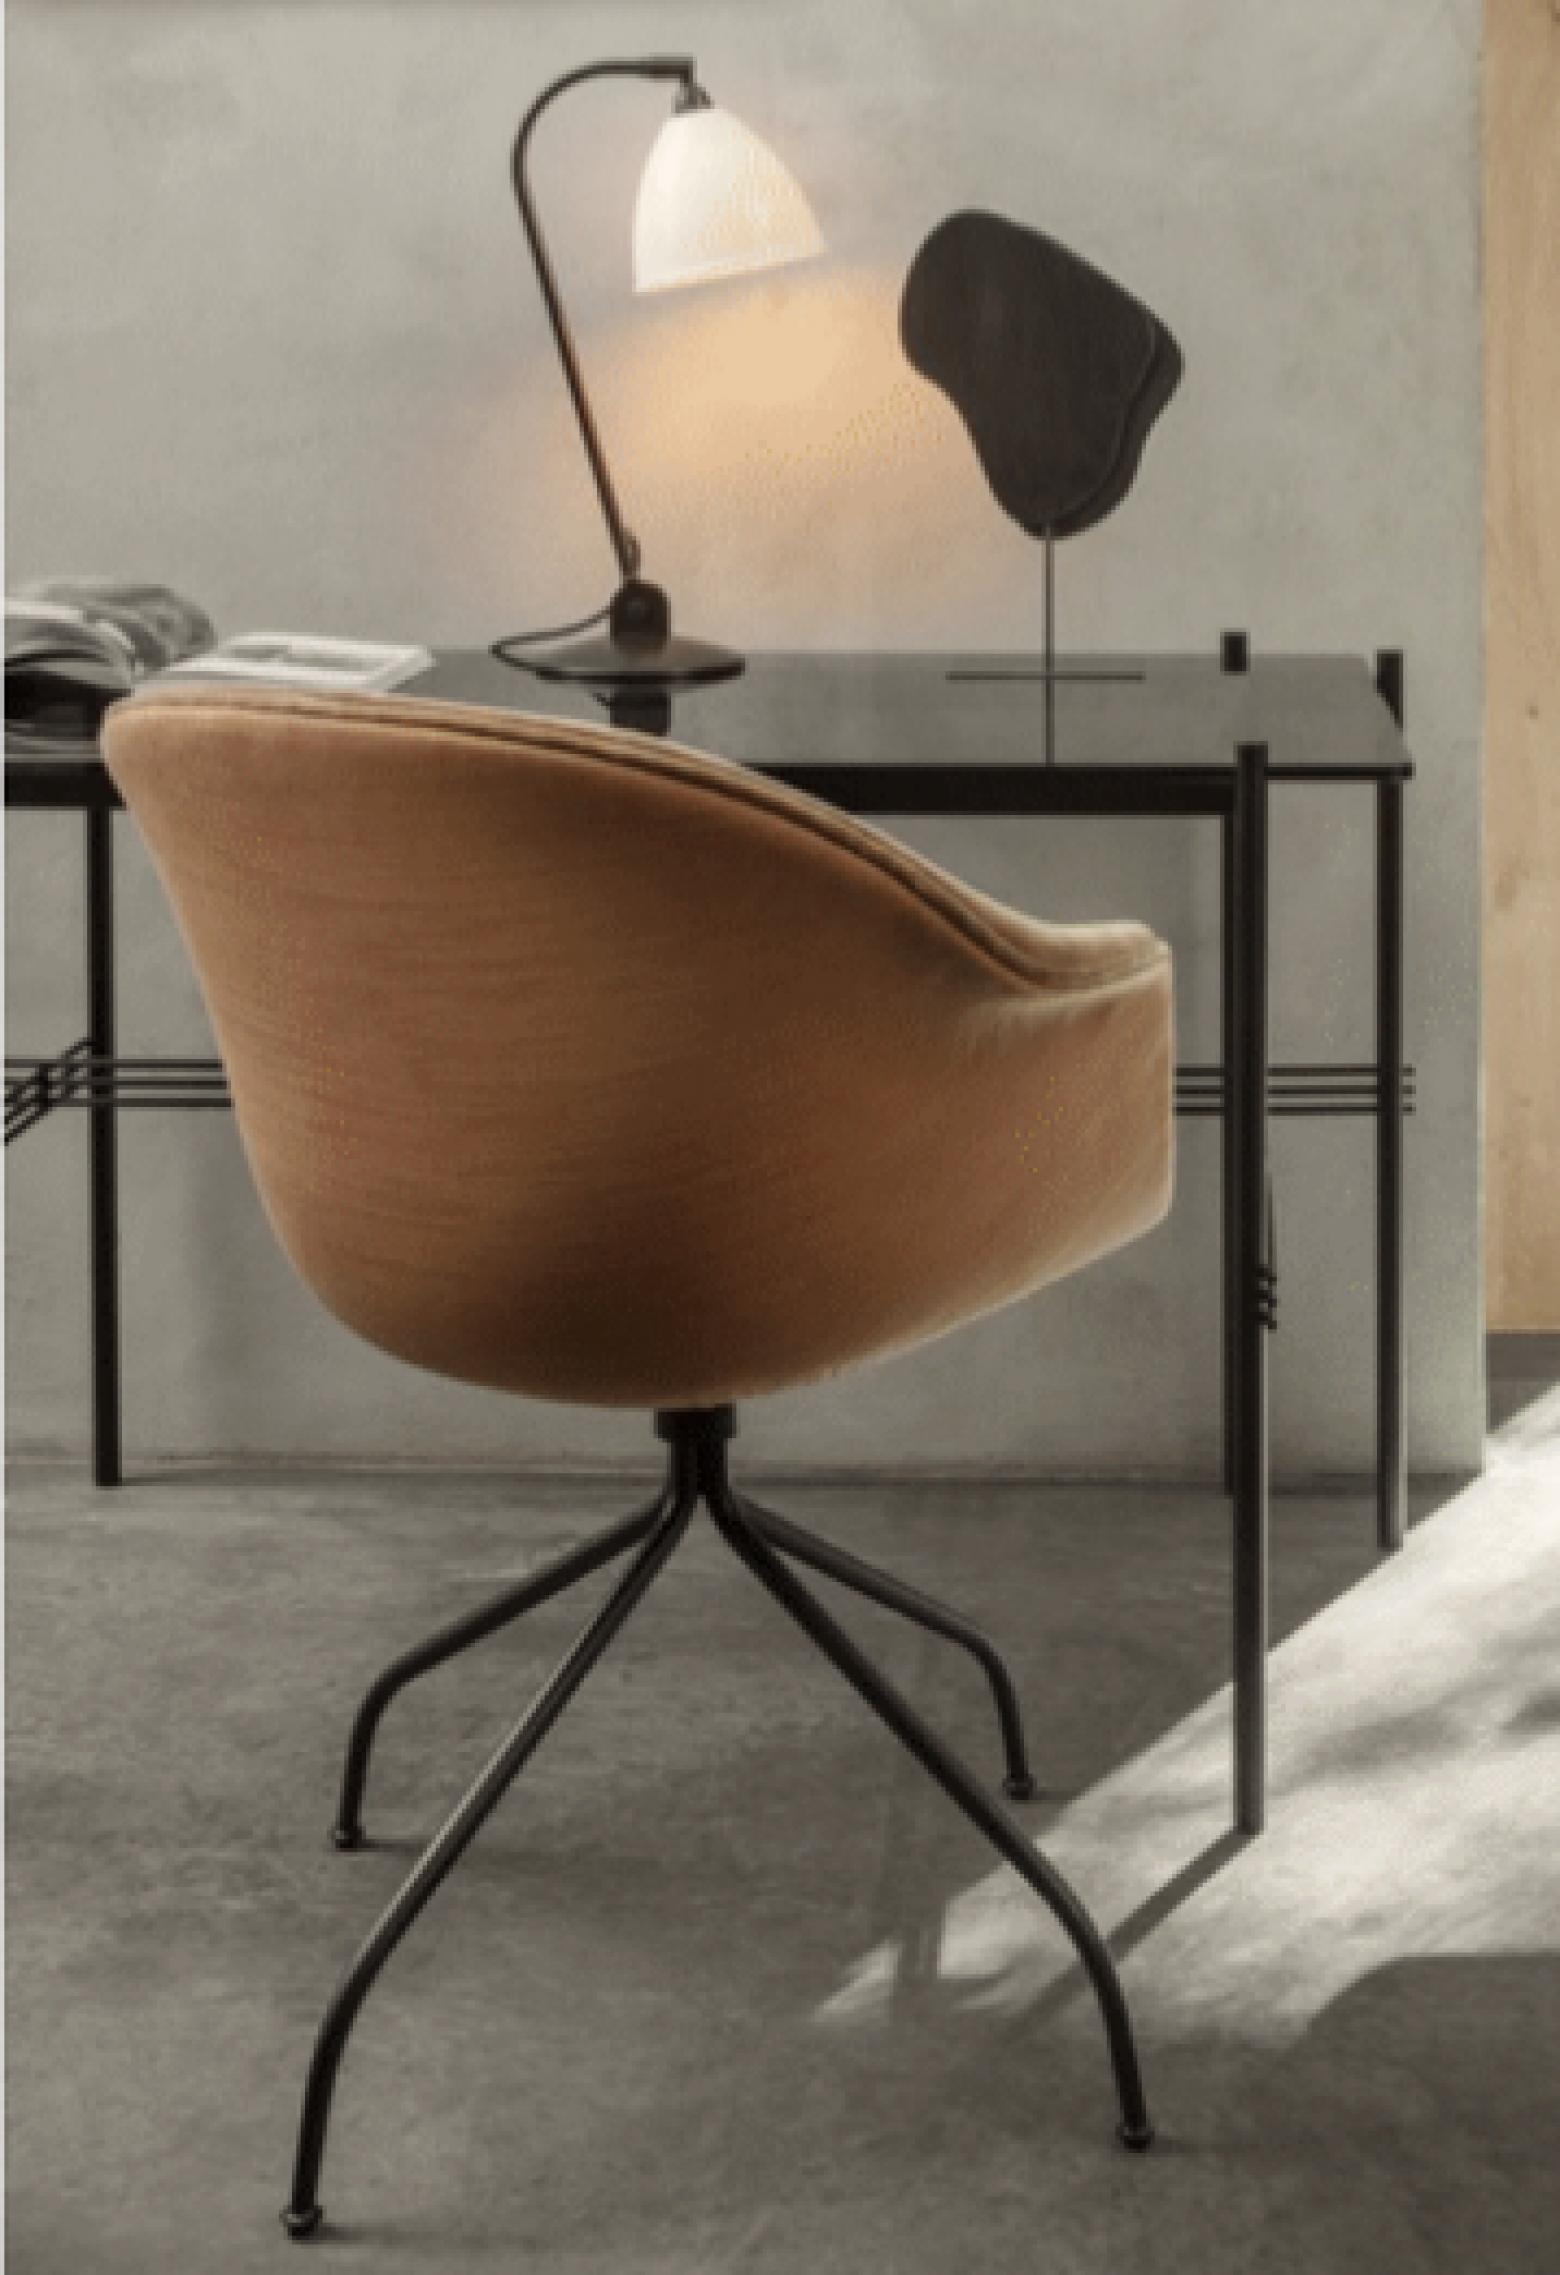 de comfortabele Bat meeting chair swivel base Victors Design Agency